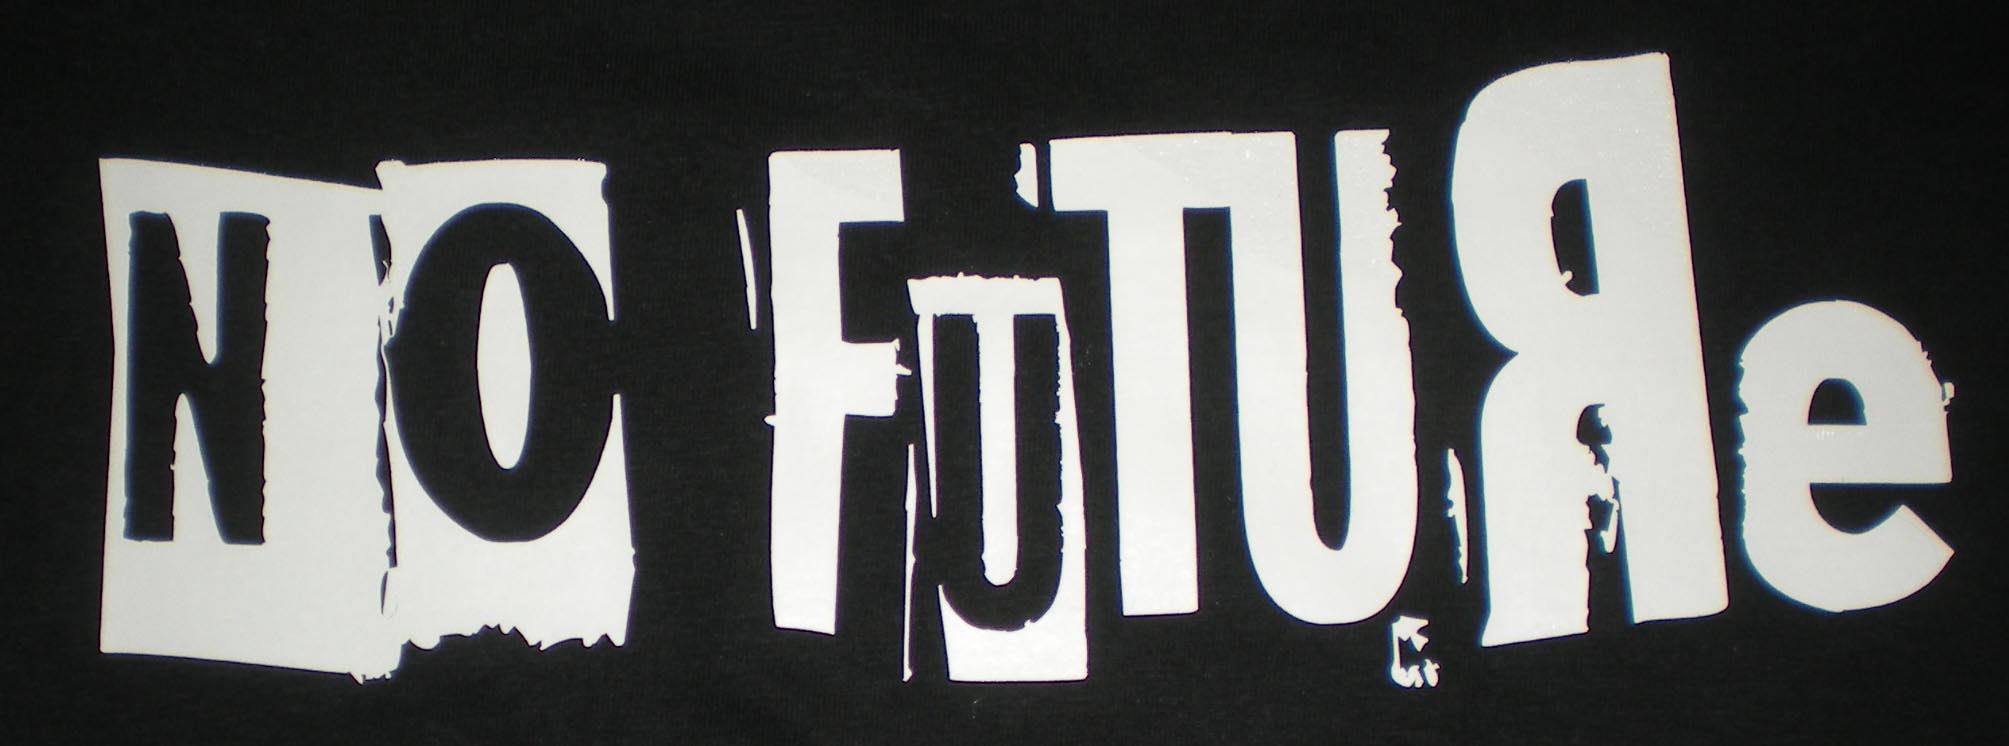 tumblr_static_motif_no_future_fond_noir